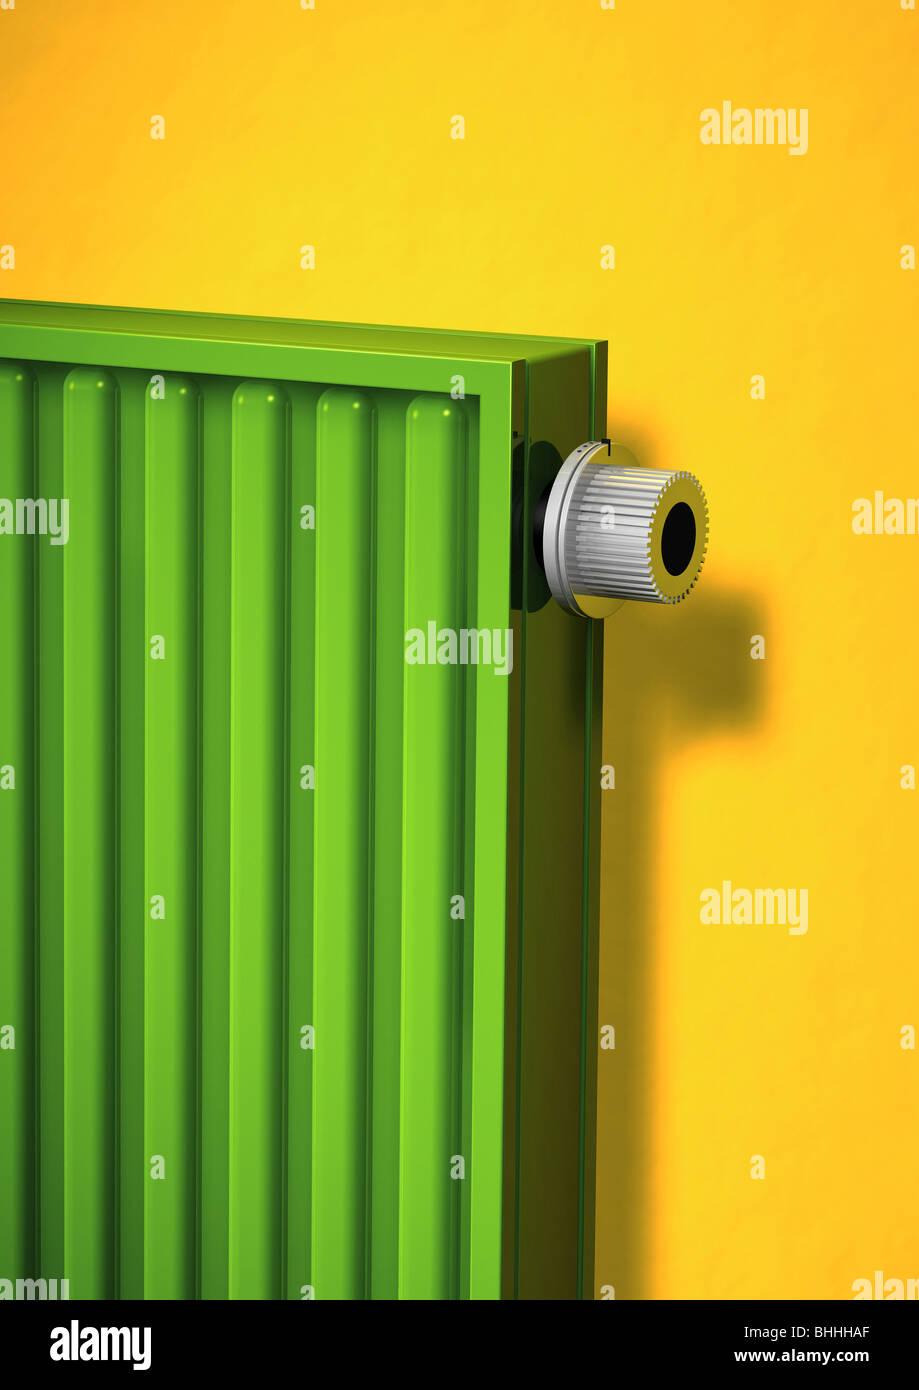 green radiator with themostatic valve - Gruener Heizkoerper mit Thermostatventil - Stock Image